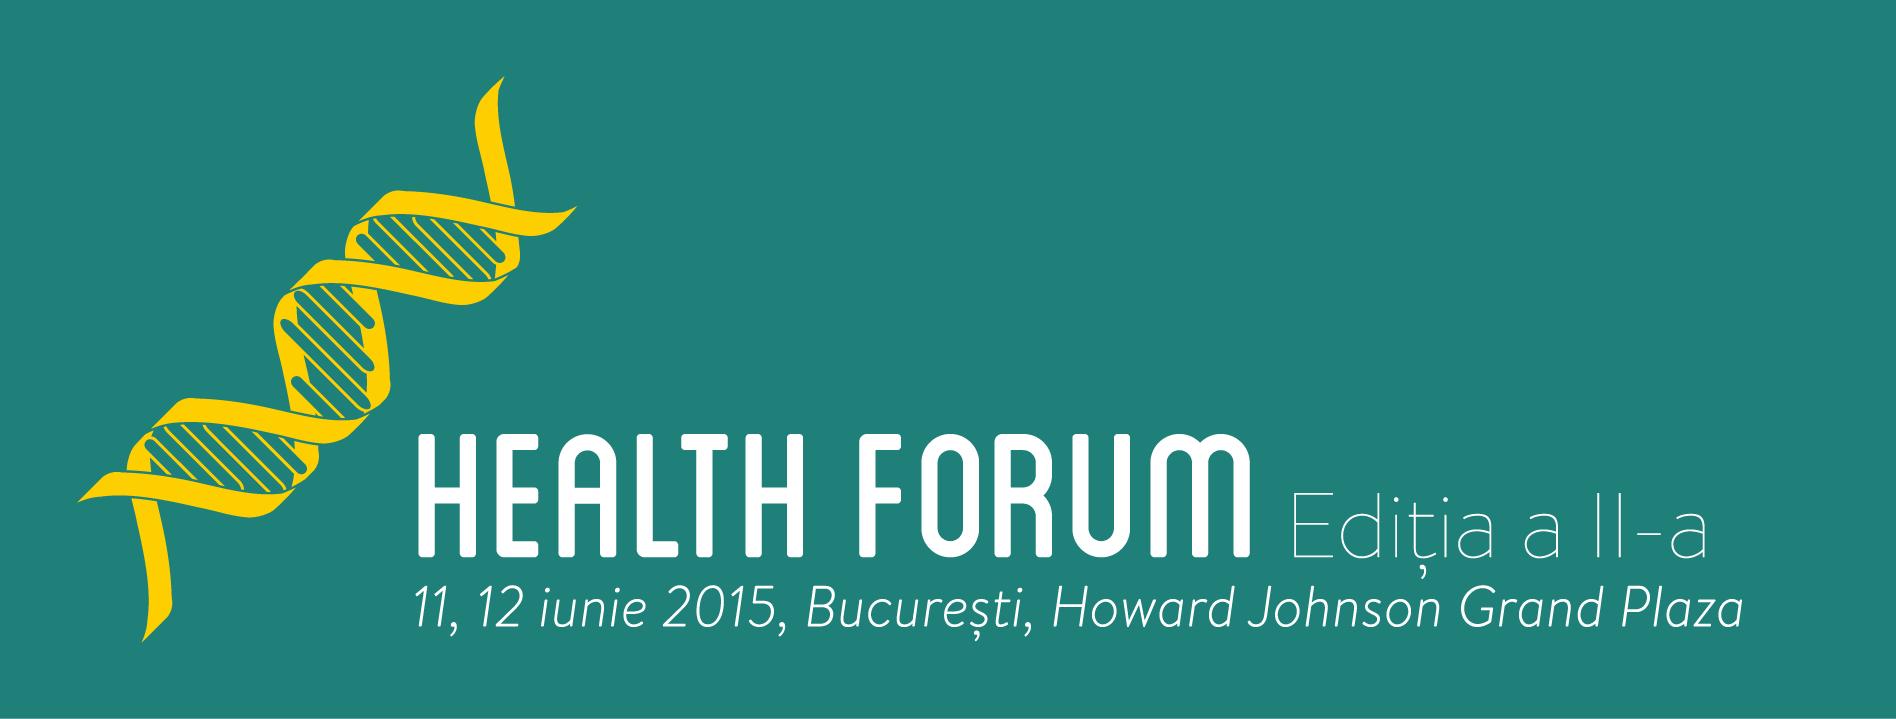 Health Forum. Editia a II-a